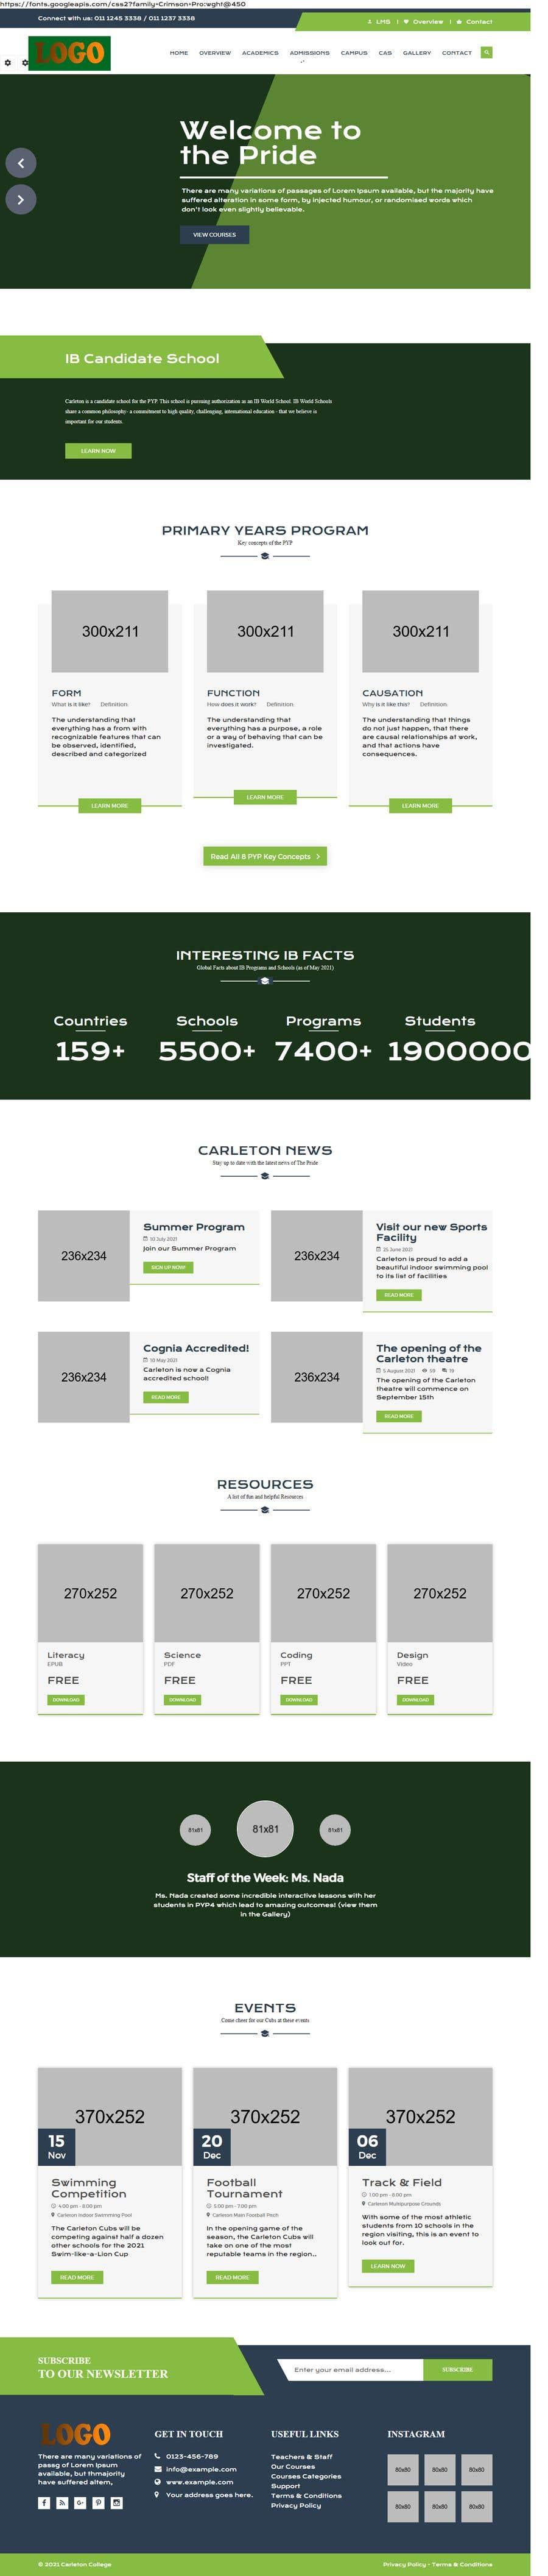 Bài tham dự cuộc thi #                                        4                                      cho                                         Create a single page design for an existing site